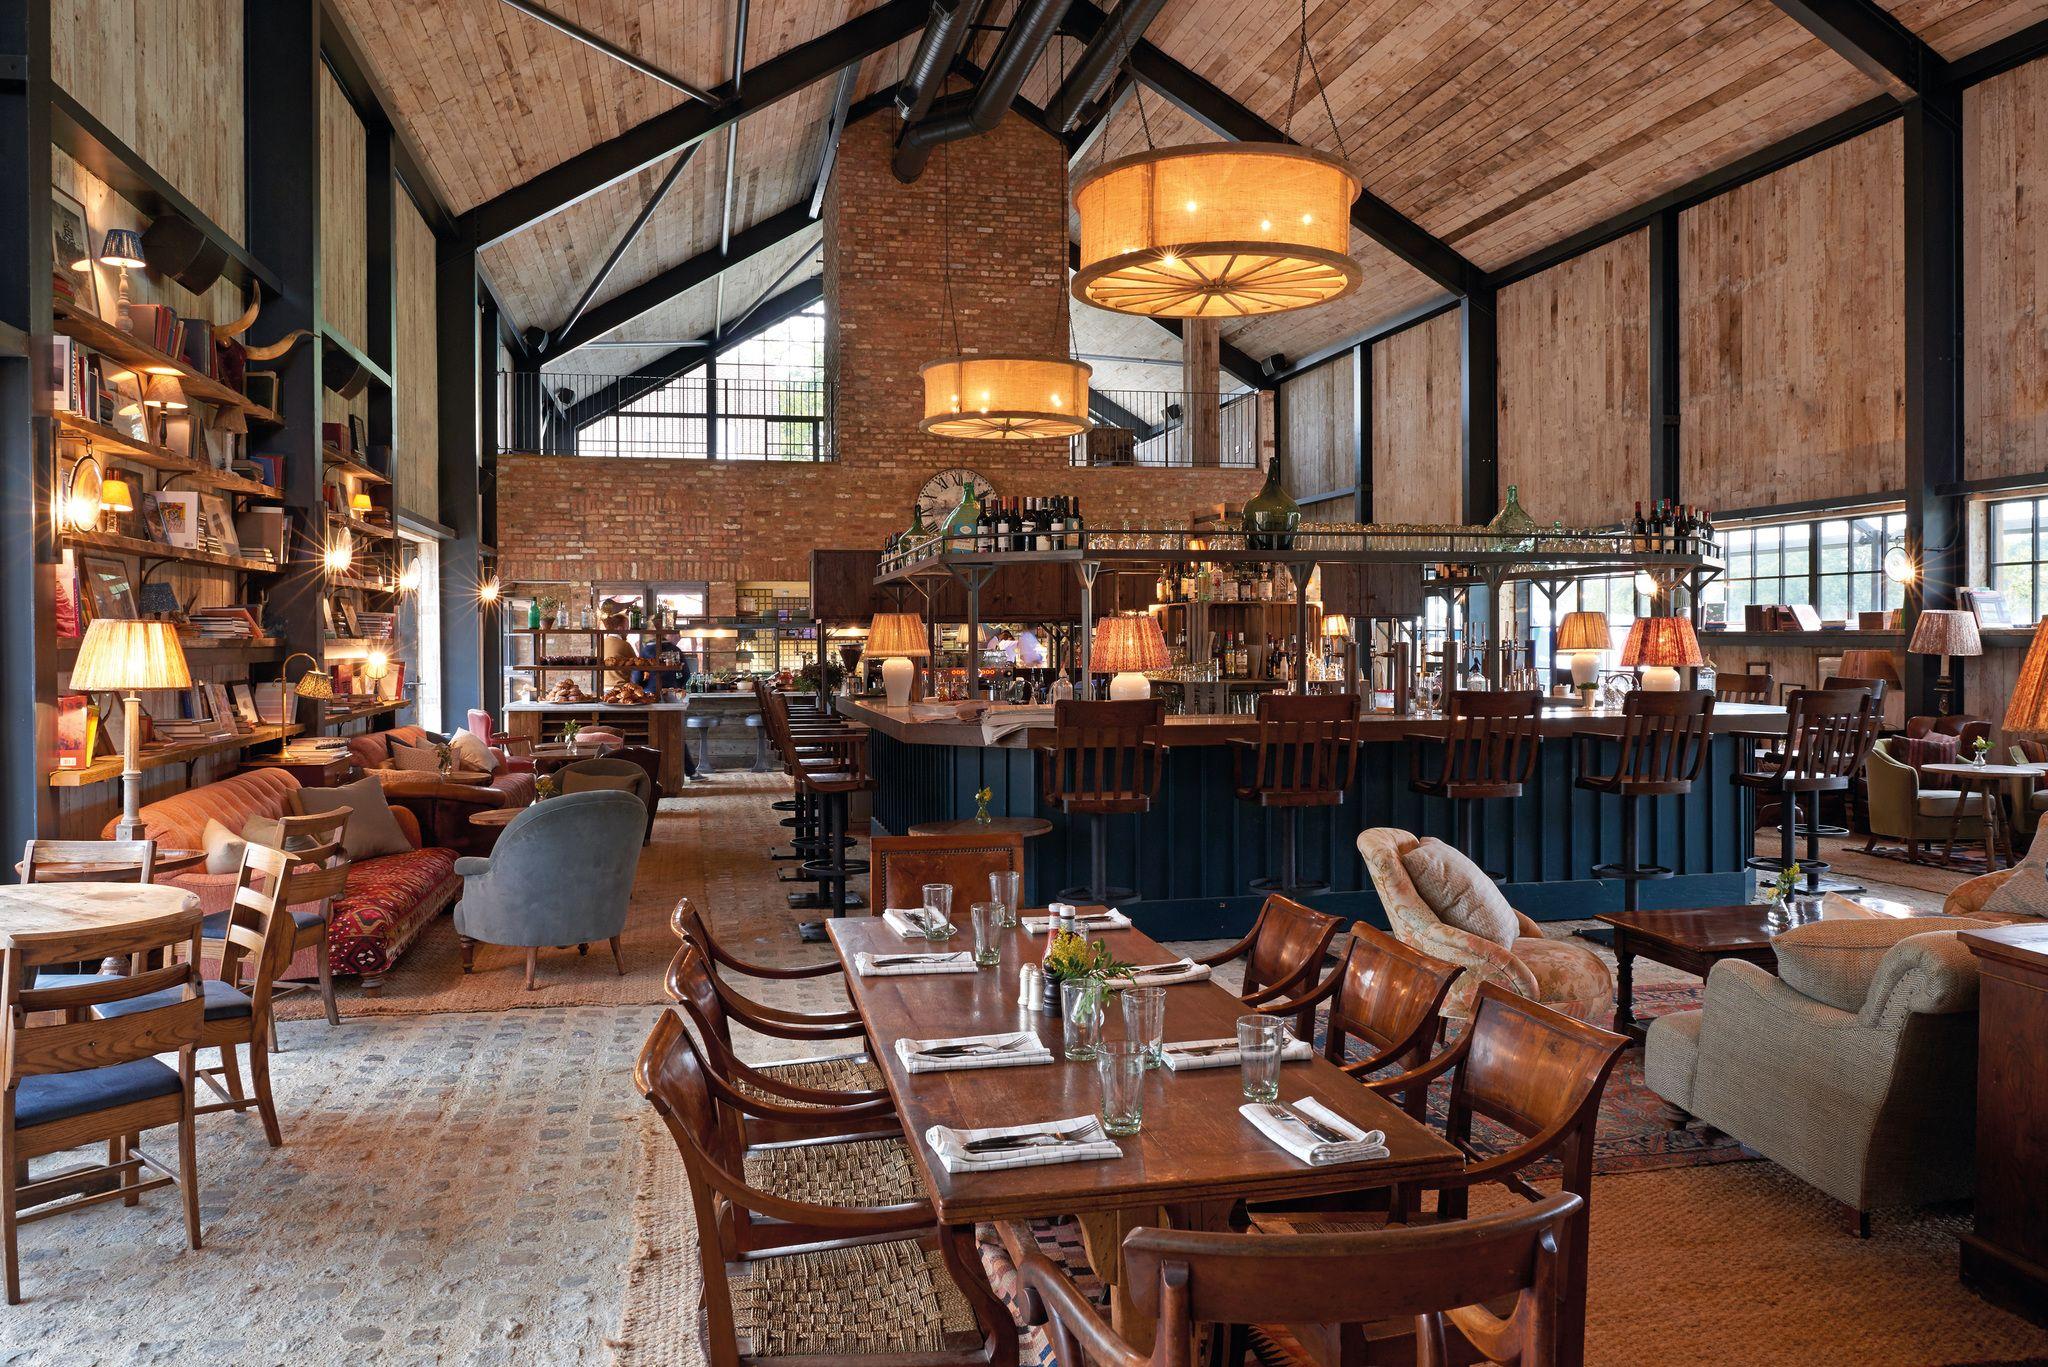 Copyright_soho_farm_house_main_barn_sm16 Soho House London, Barn Cafe,  Salons Cosy, Farmhouse Restaurant, Farm Restaurant